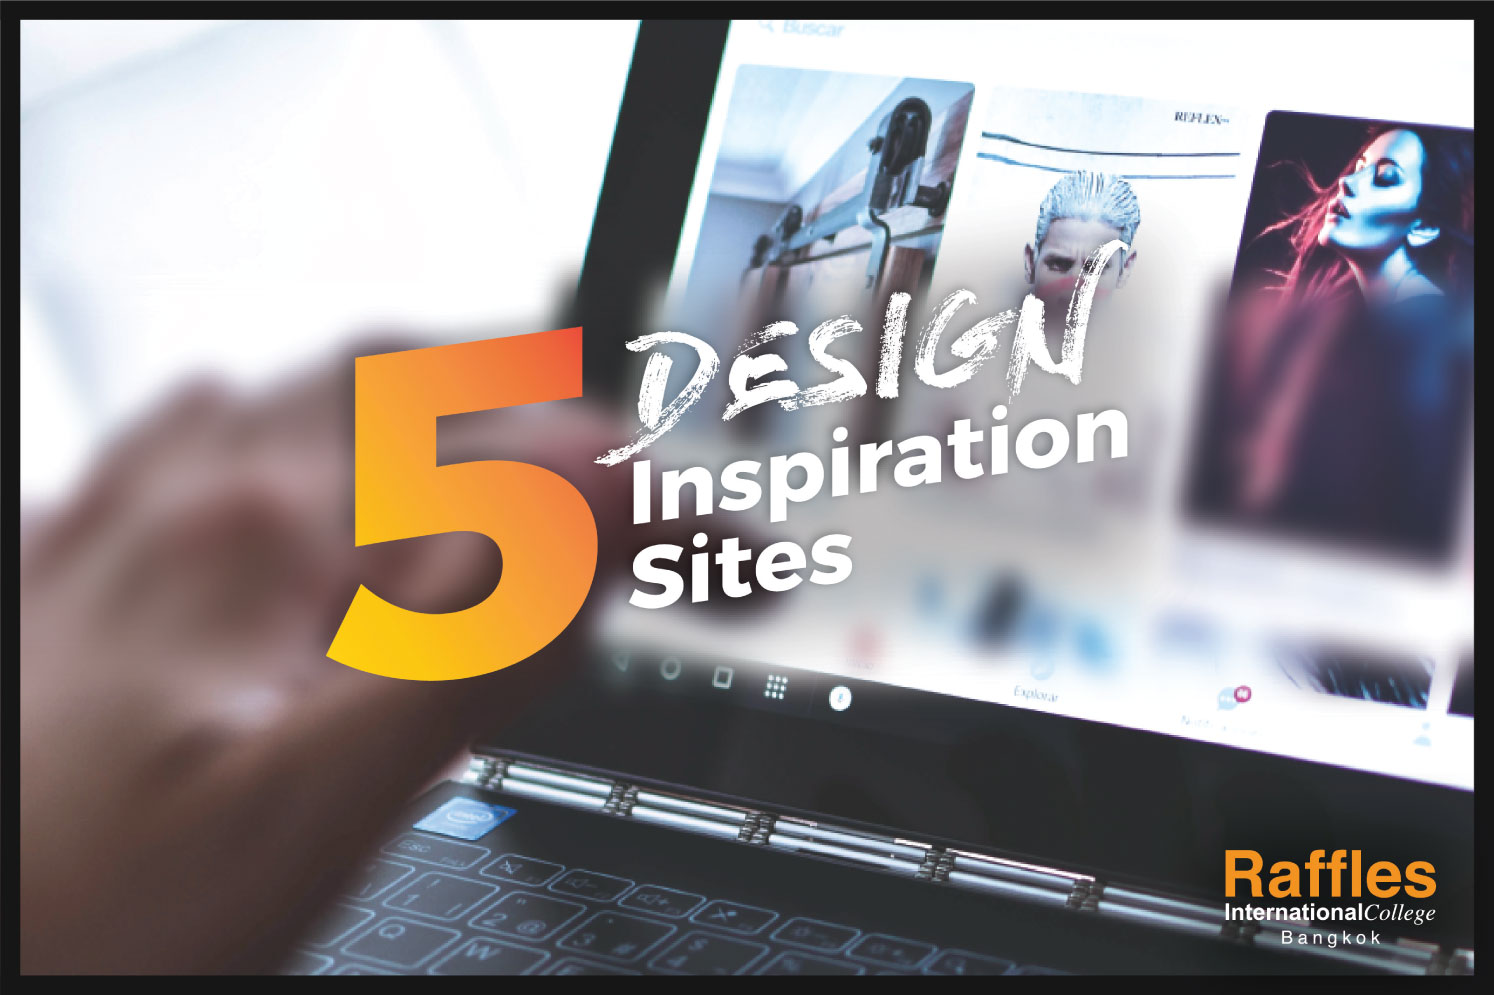 5 Design Inspiration Sites